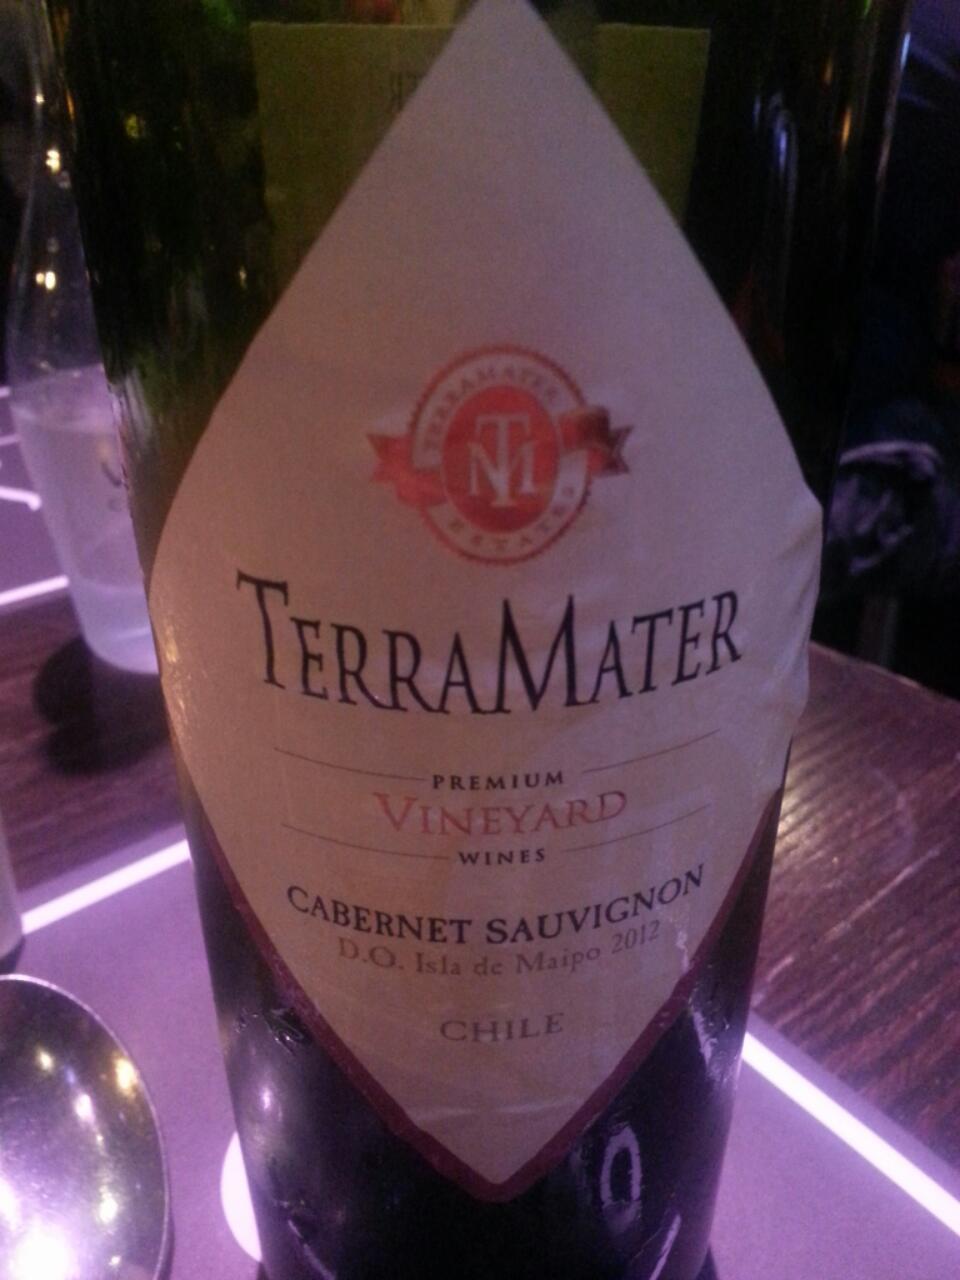 Terra Mater Premium Maipo Valley Cabernet Sauvignon 2007